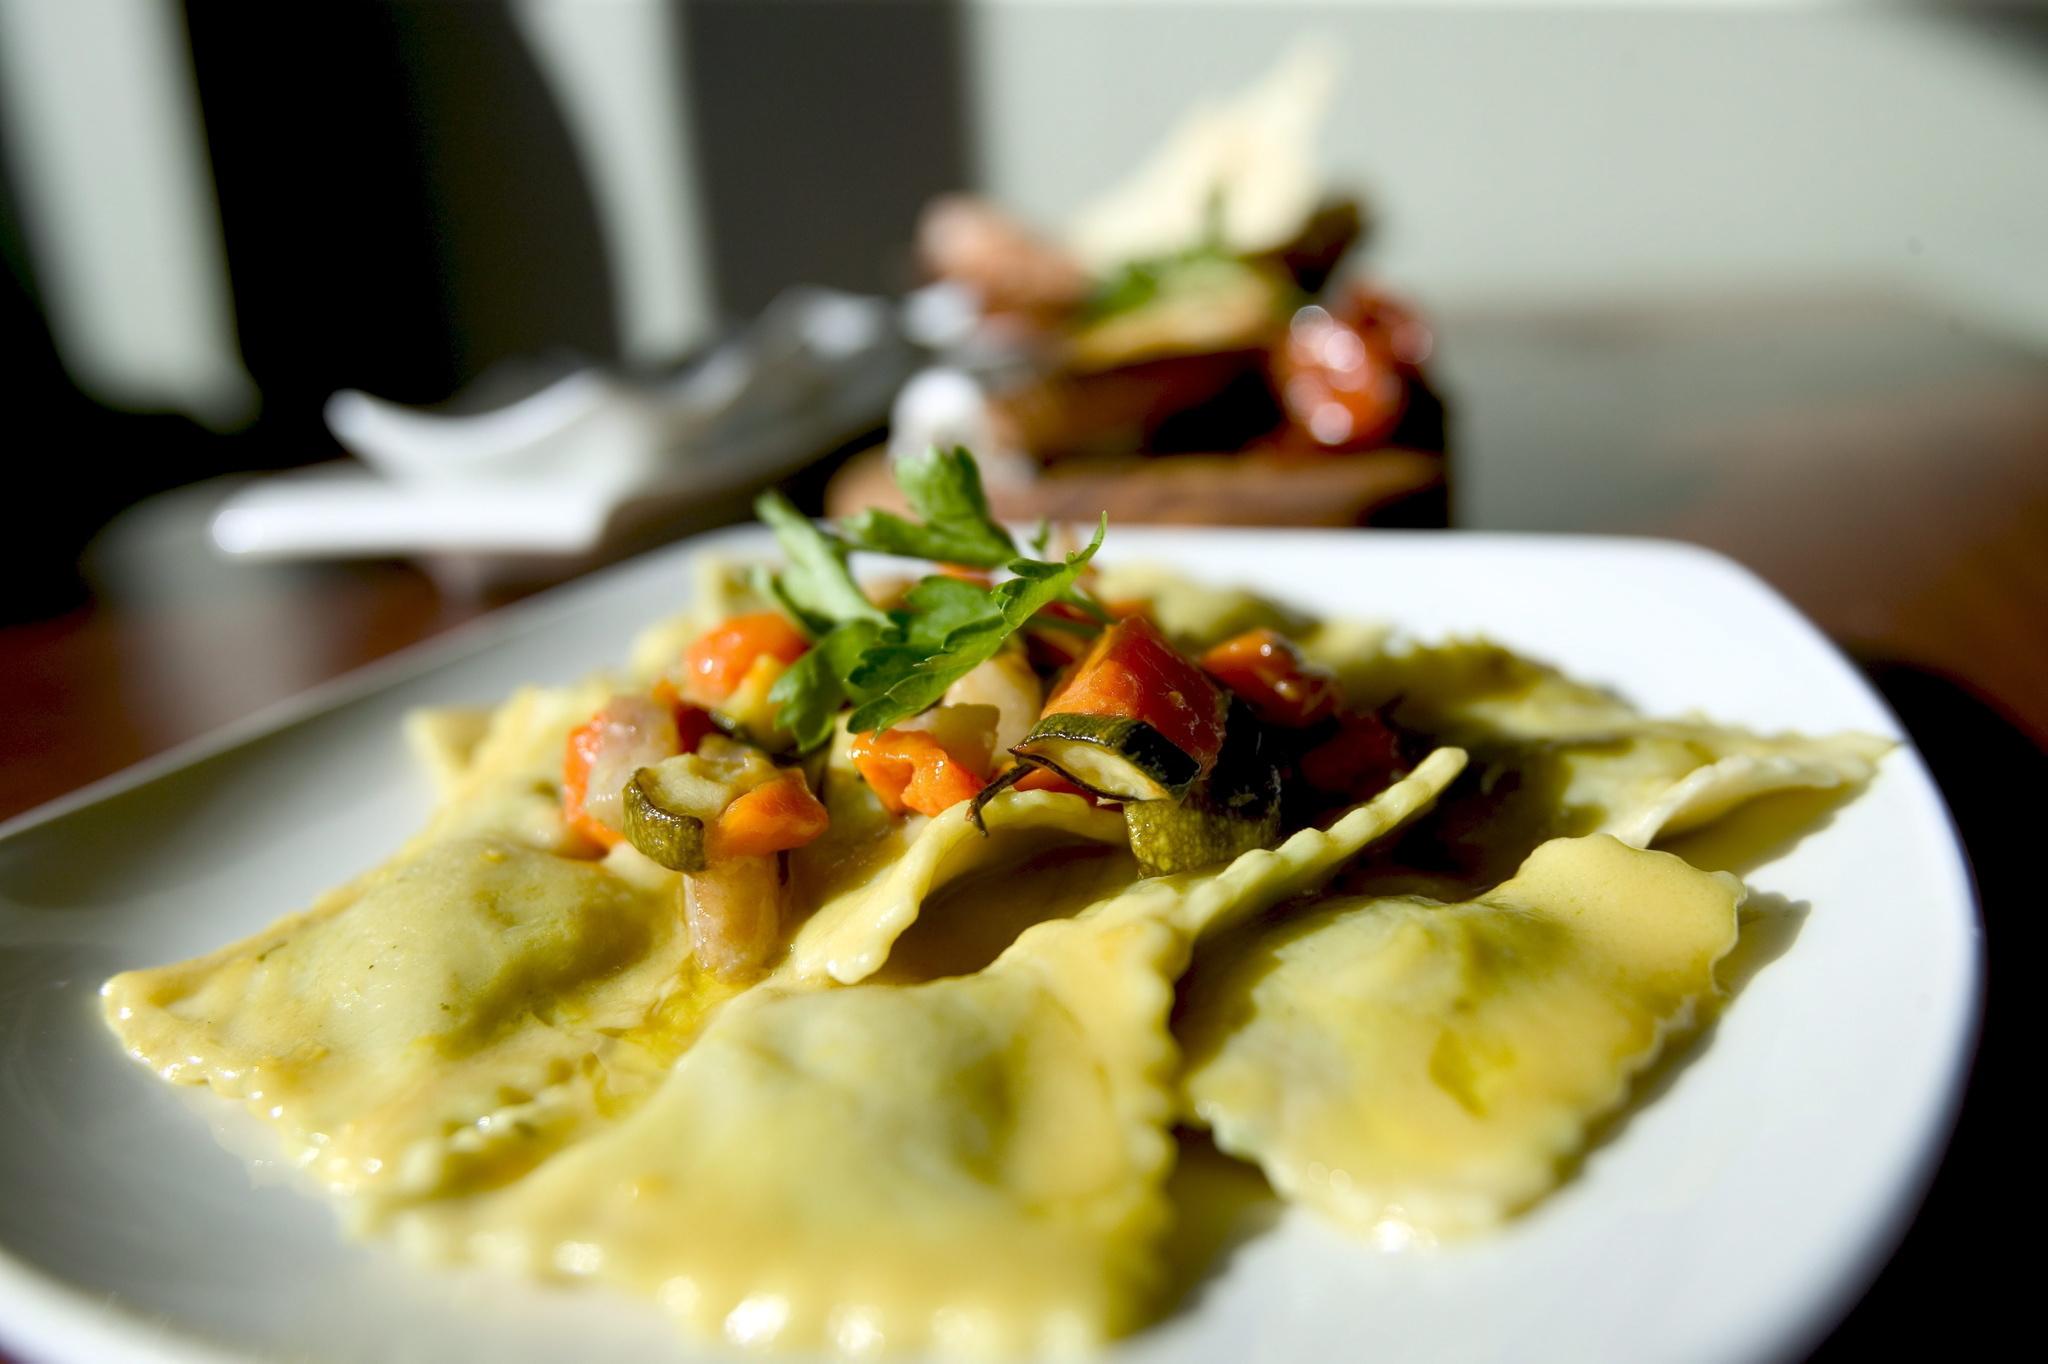 The best Italian restaurants in Miami